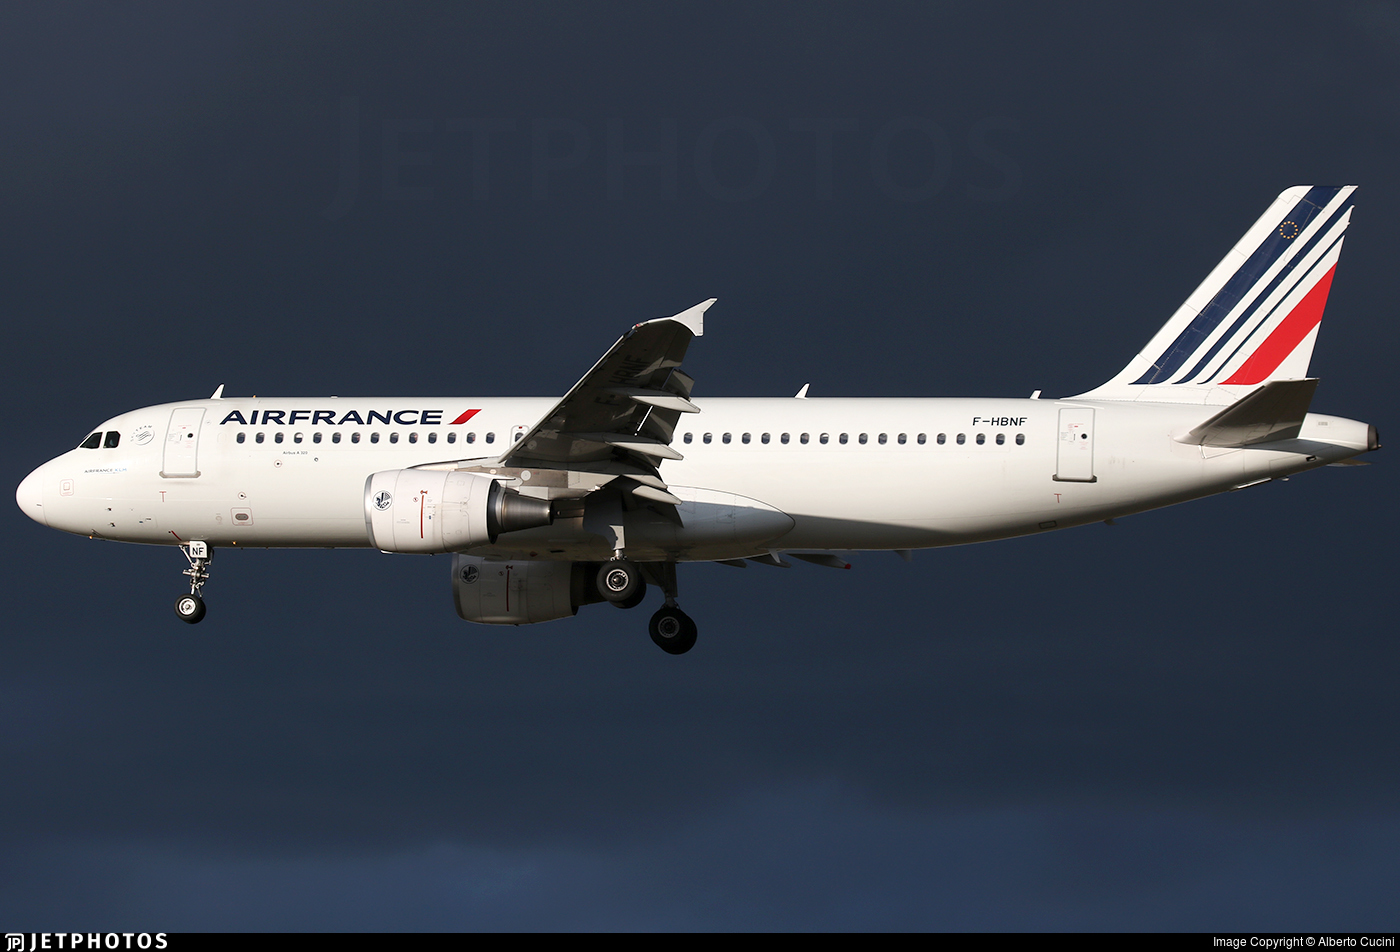 F-HBNF - Airbus A320-214 - Air France